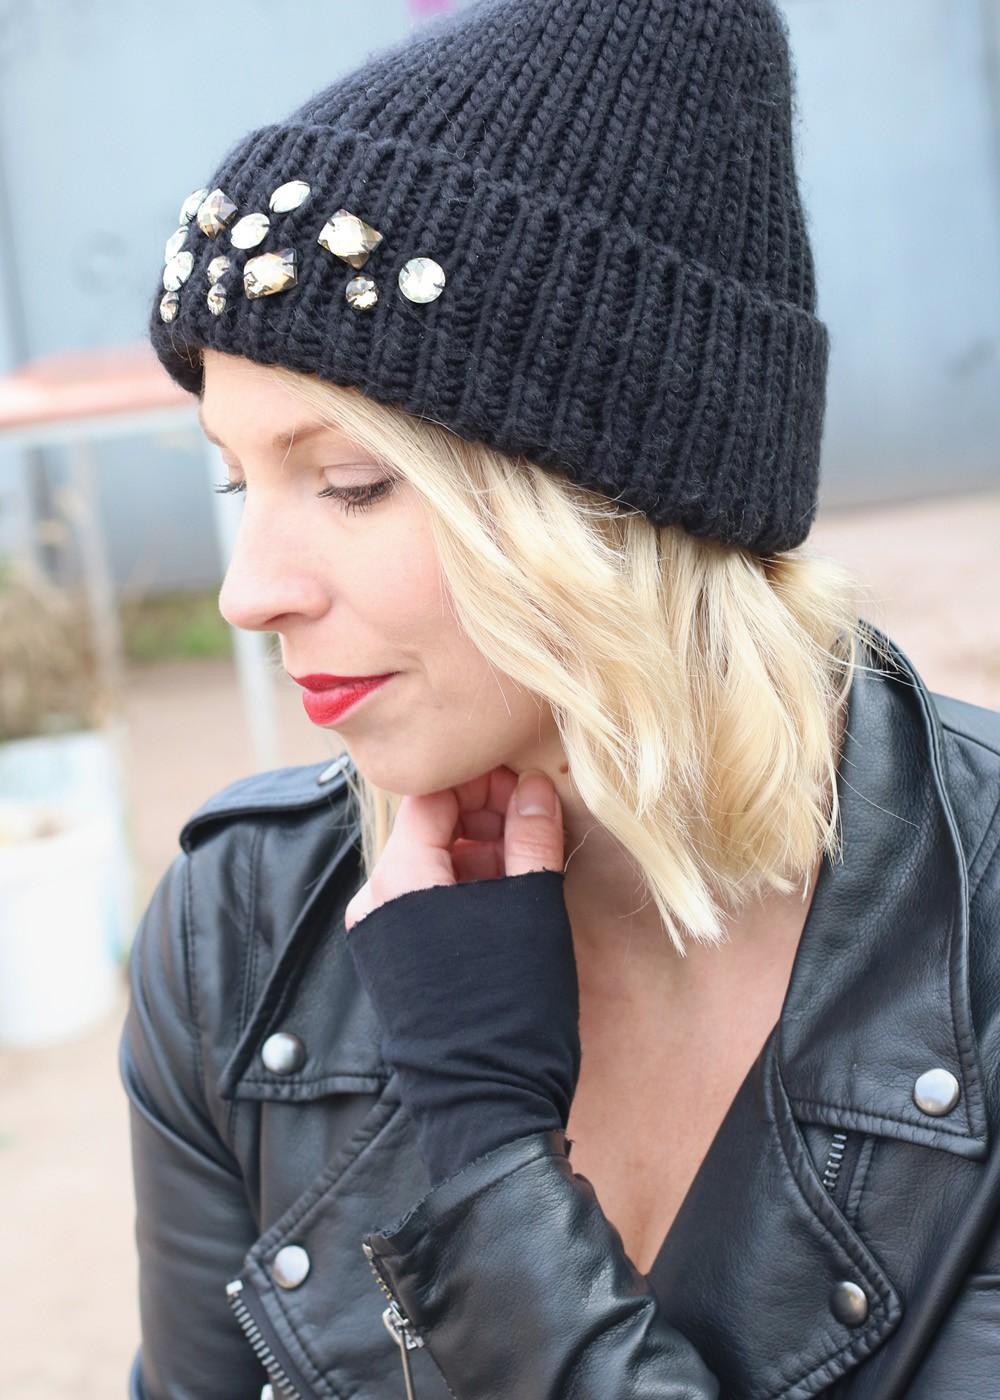 Fashionblogger Karlsruhe Outfit Kleid Lederjacke Bikerboots Beanie all in black (11)